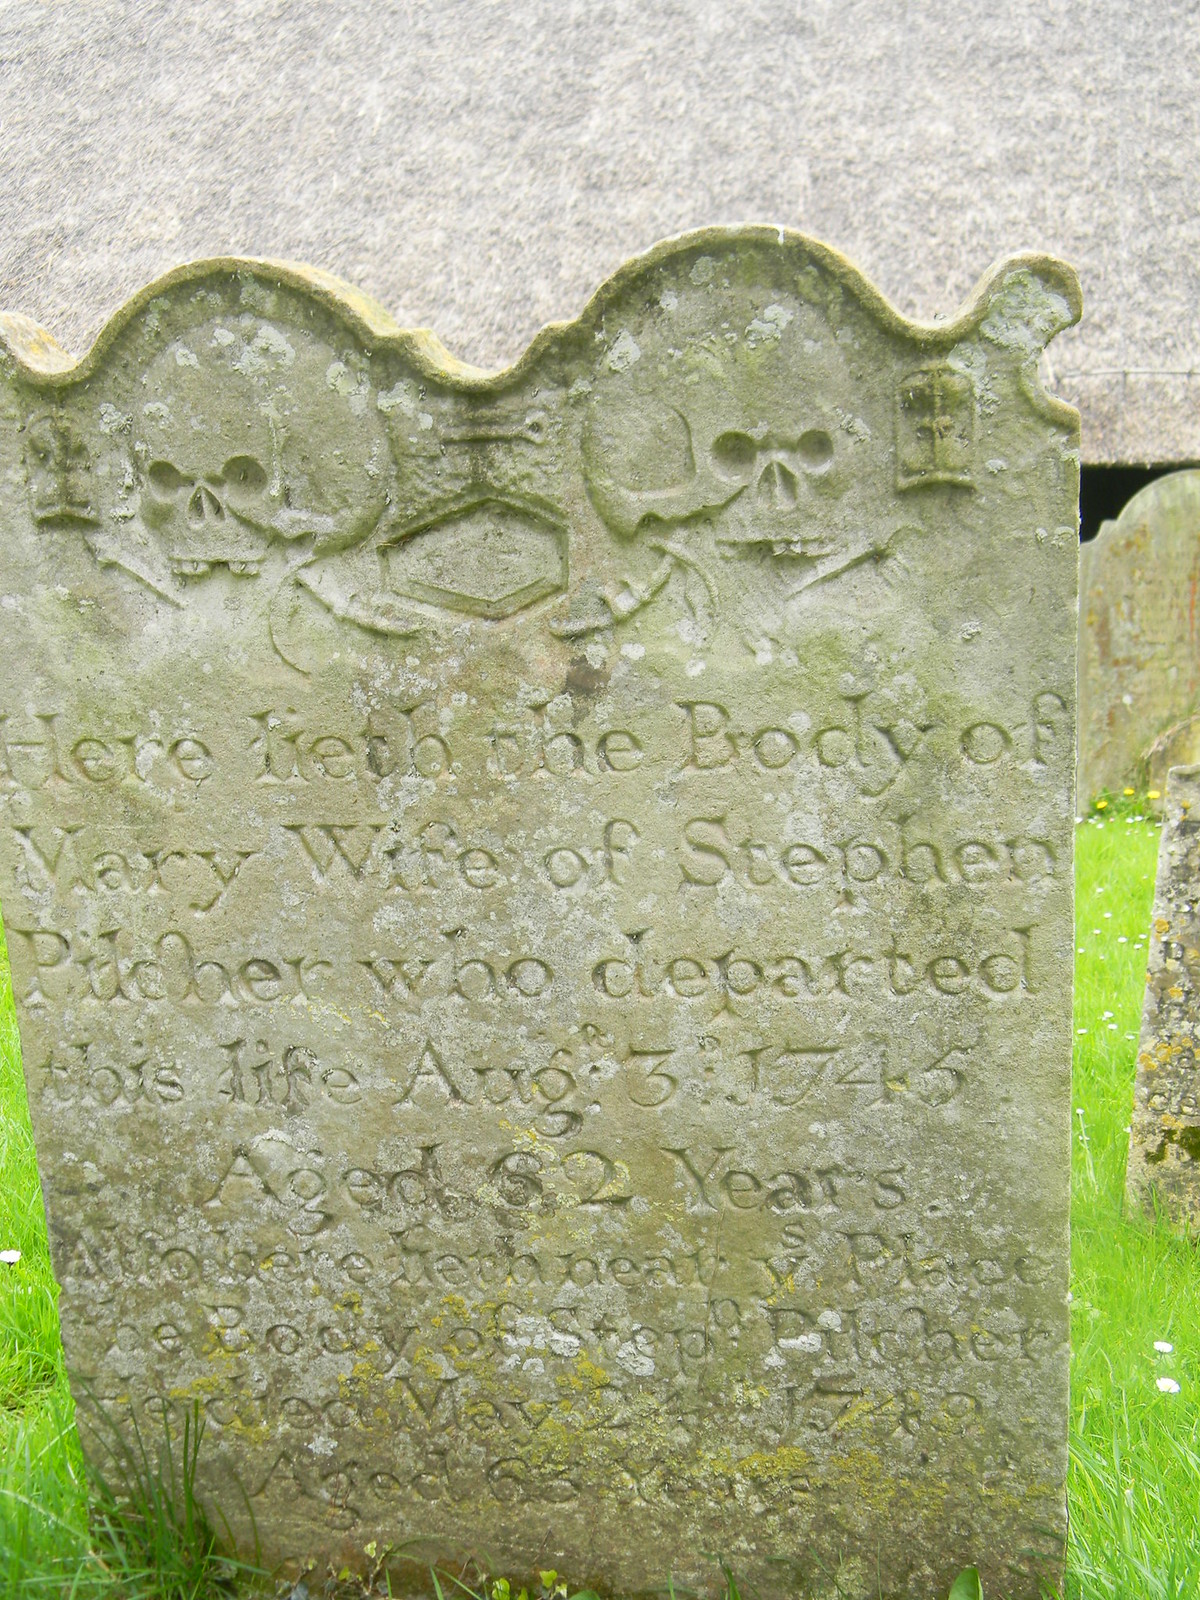 Old gravestones Littlebourne Bekesbourne Circular Thatched roof behind.